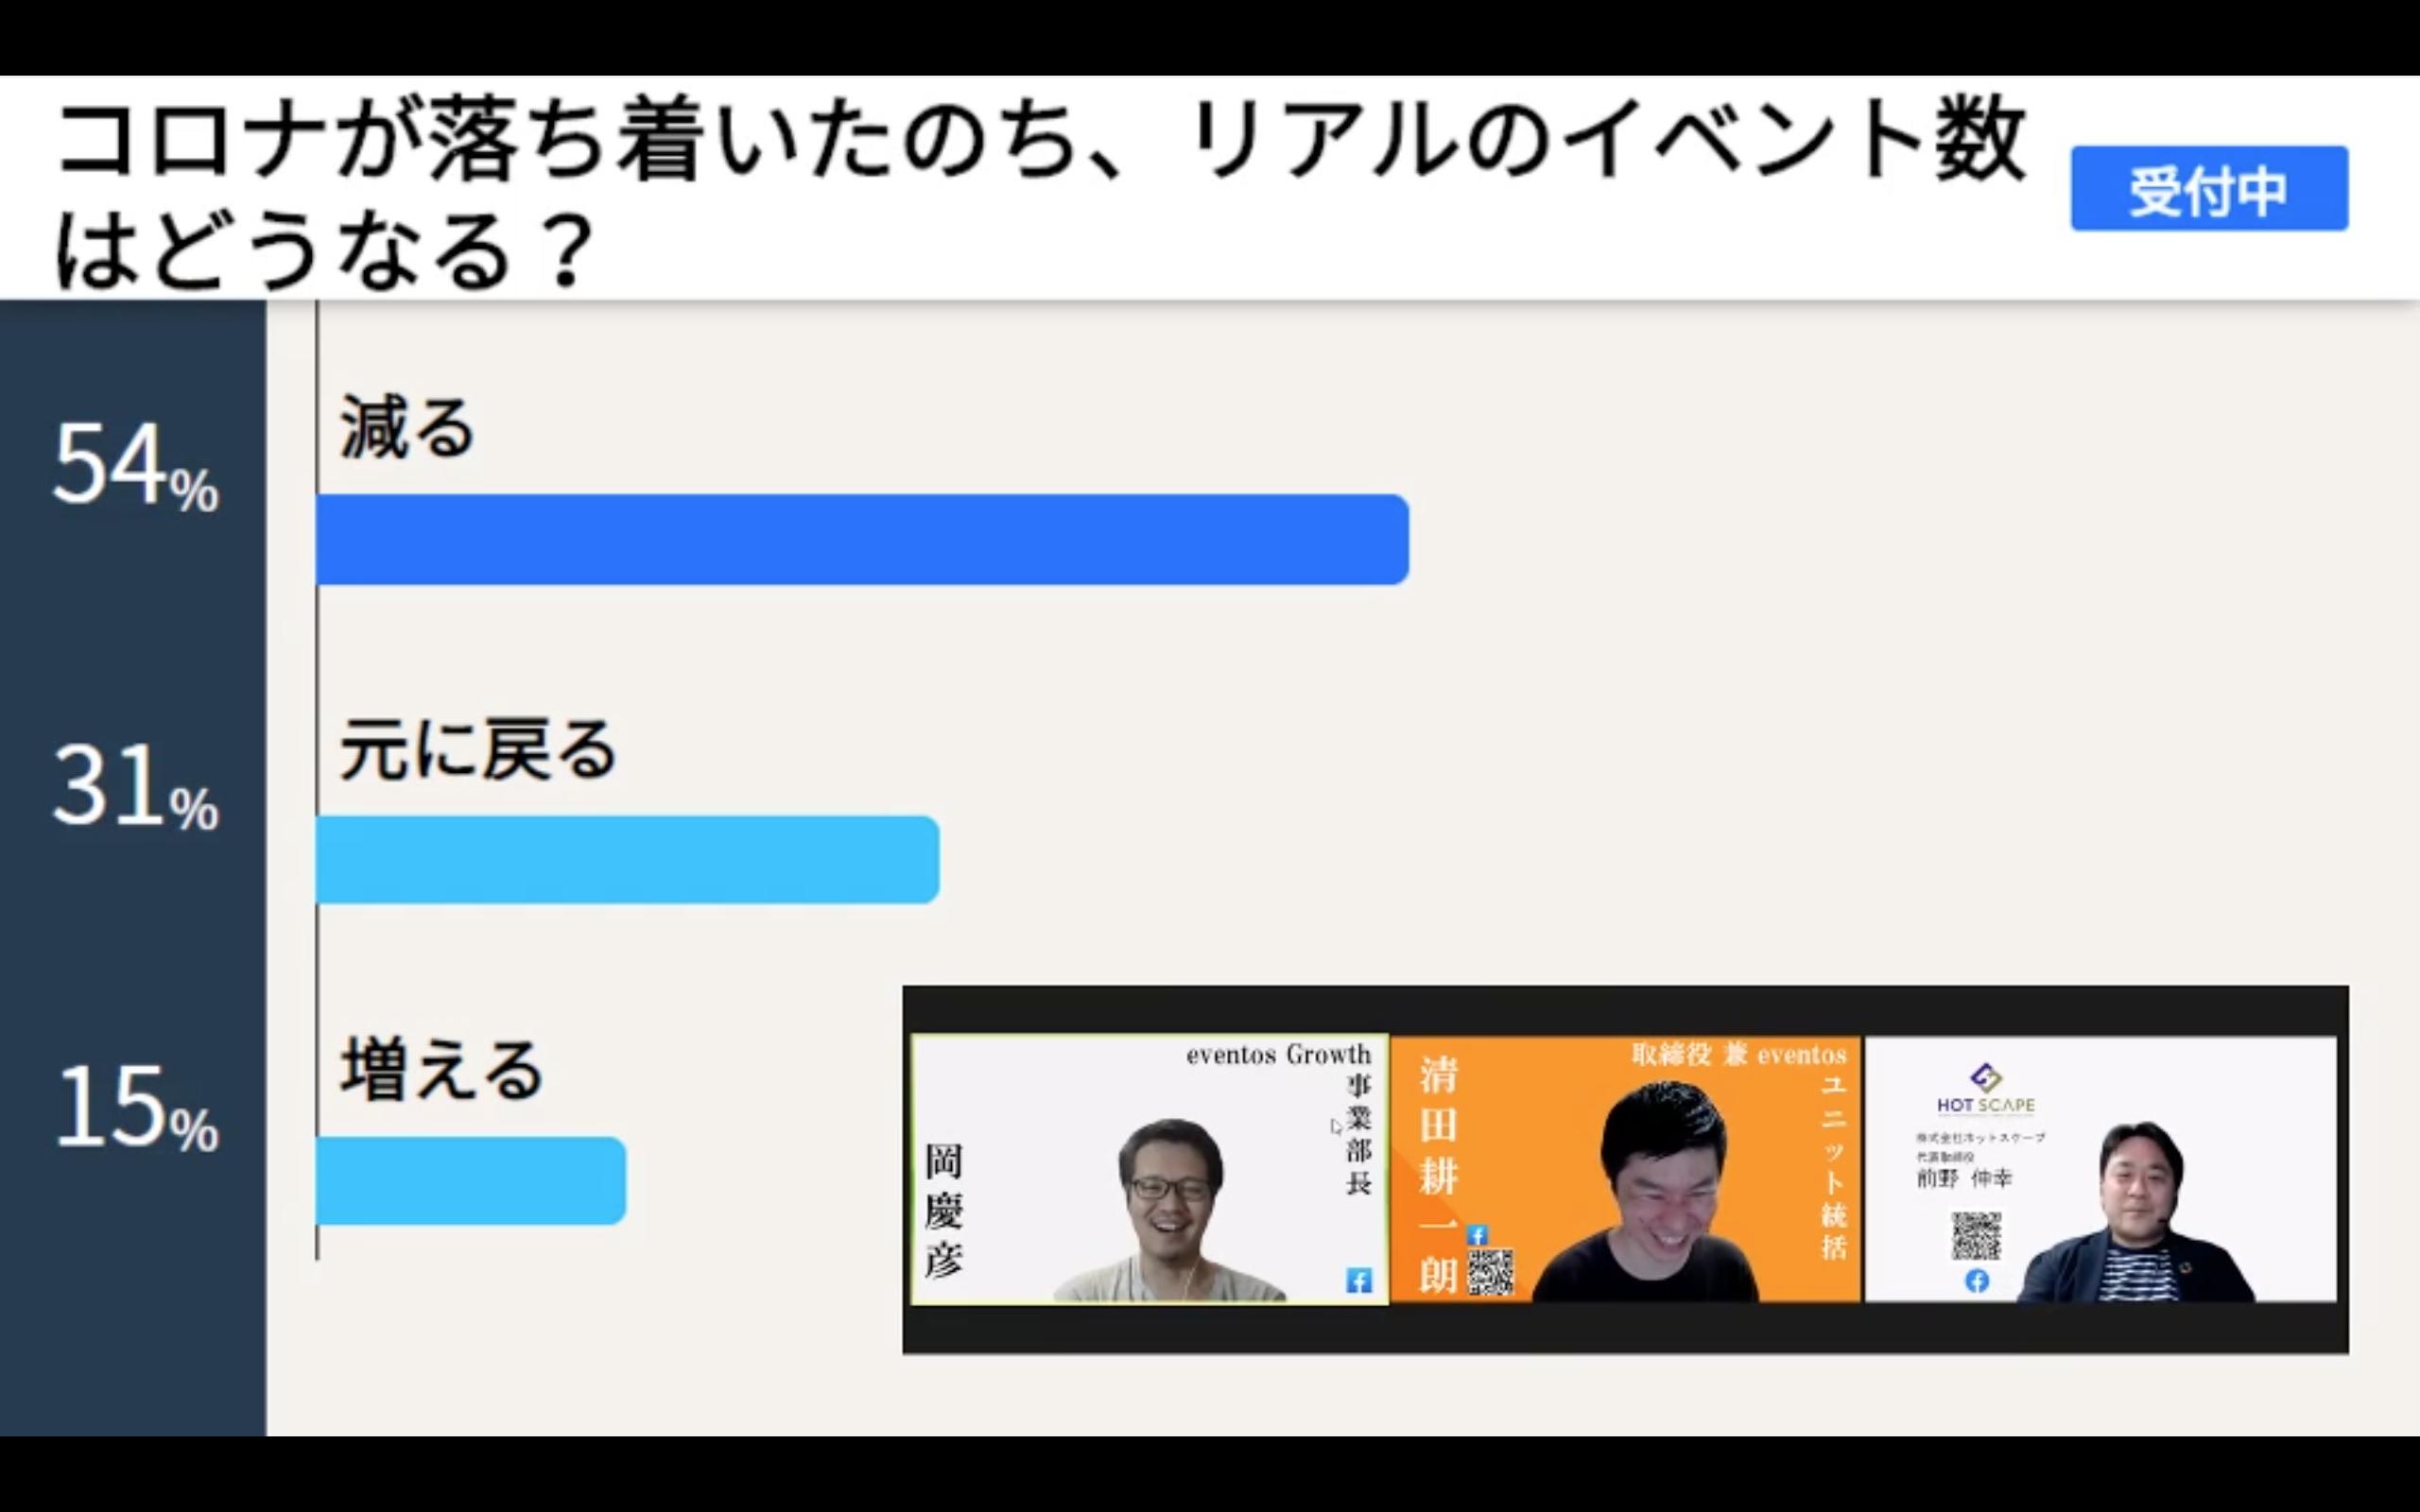 %e3%82%b9%e3%82%af%e3%83%aa%e3%83%bc%e3%83%b3%e3%82%b7%e3%83%a7%e3%83%83%e3%83%88-2020-12-10-20-38-58